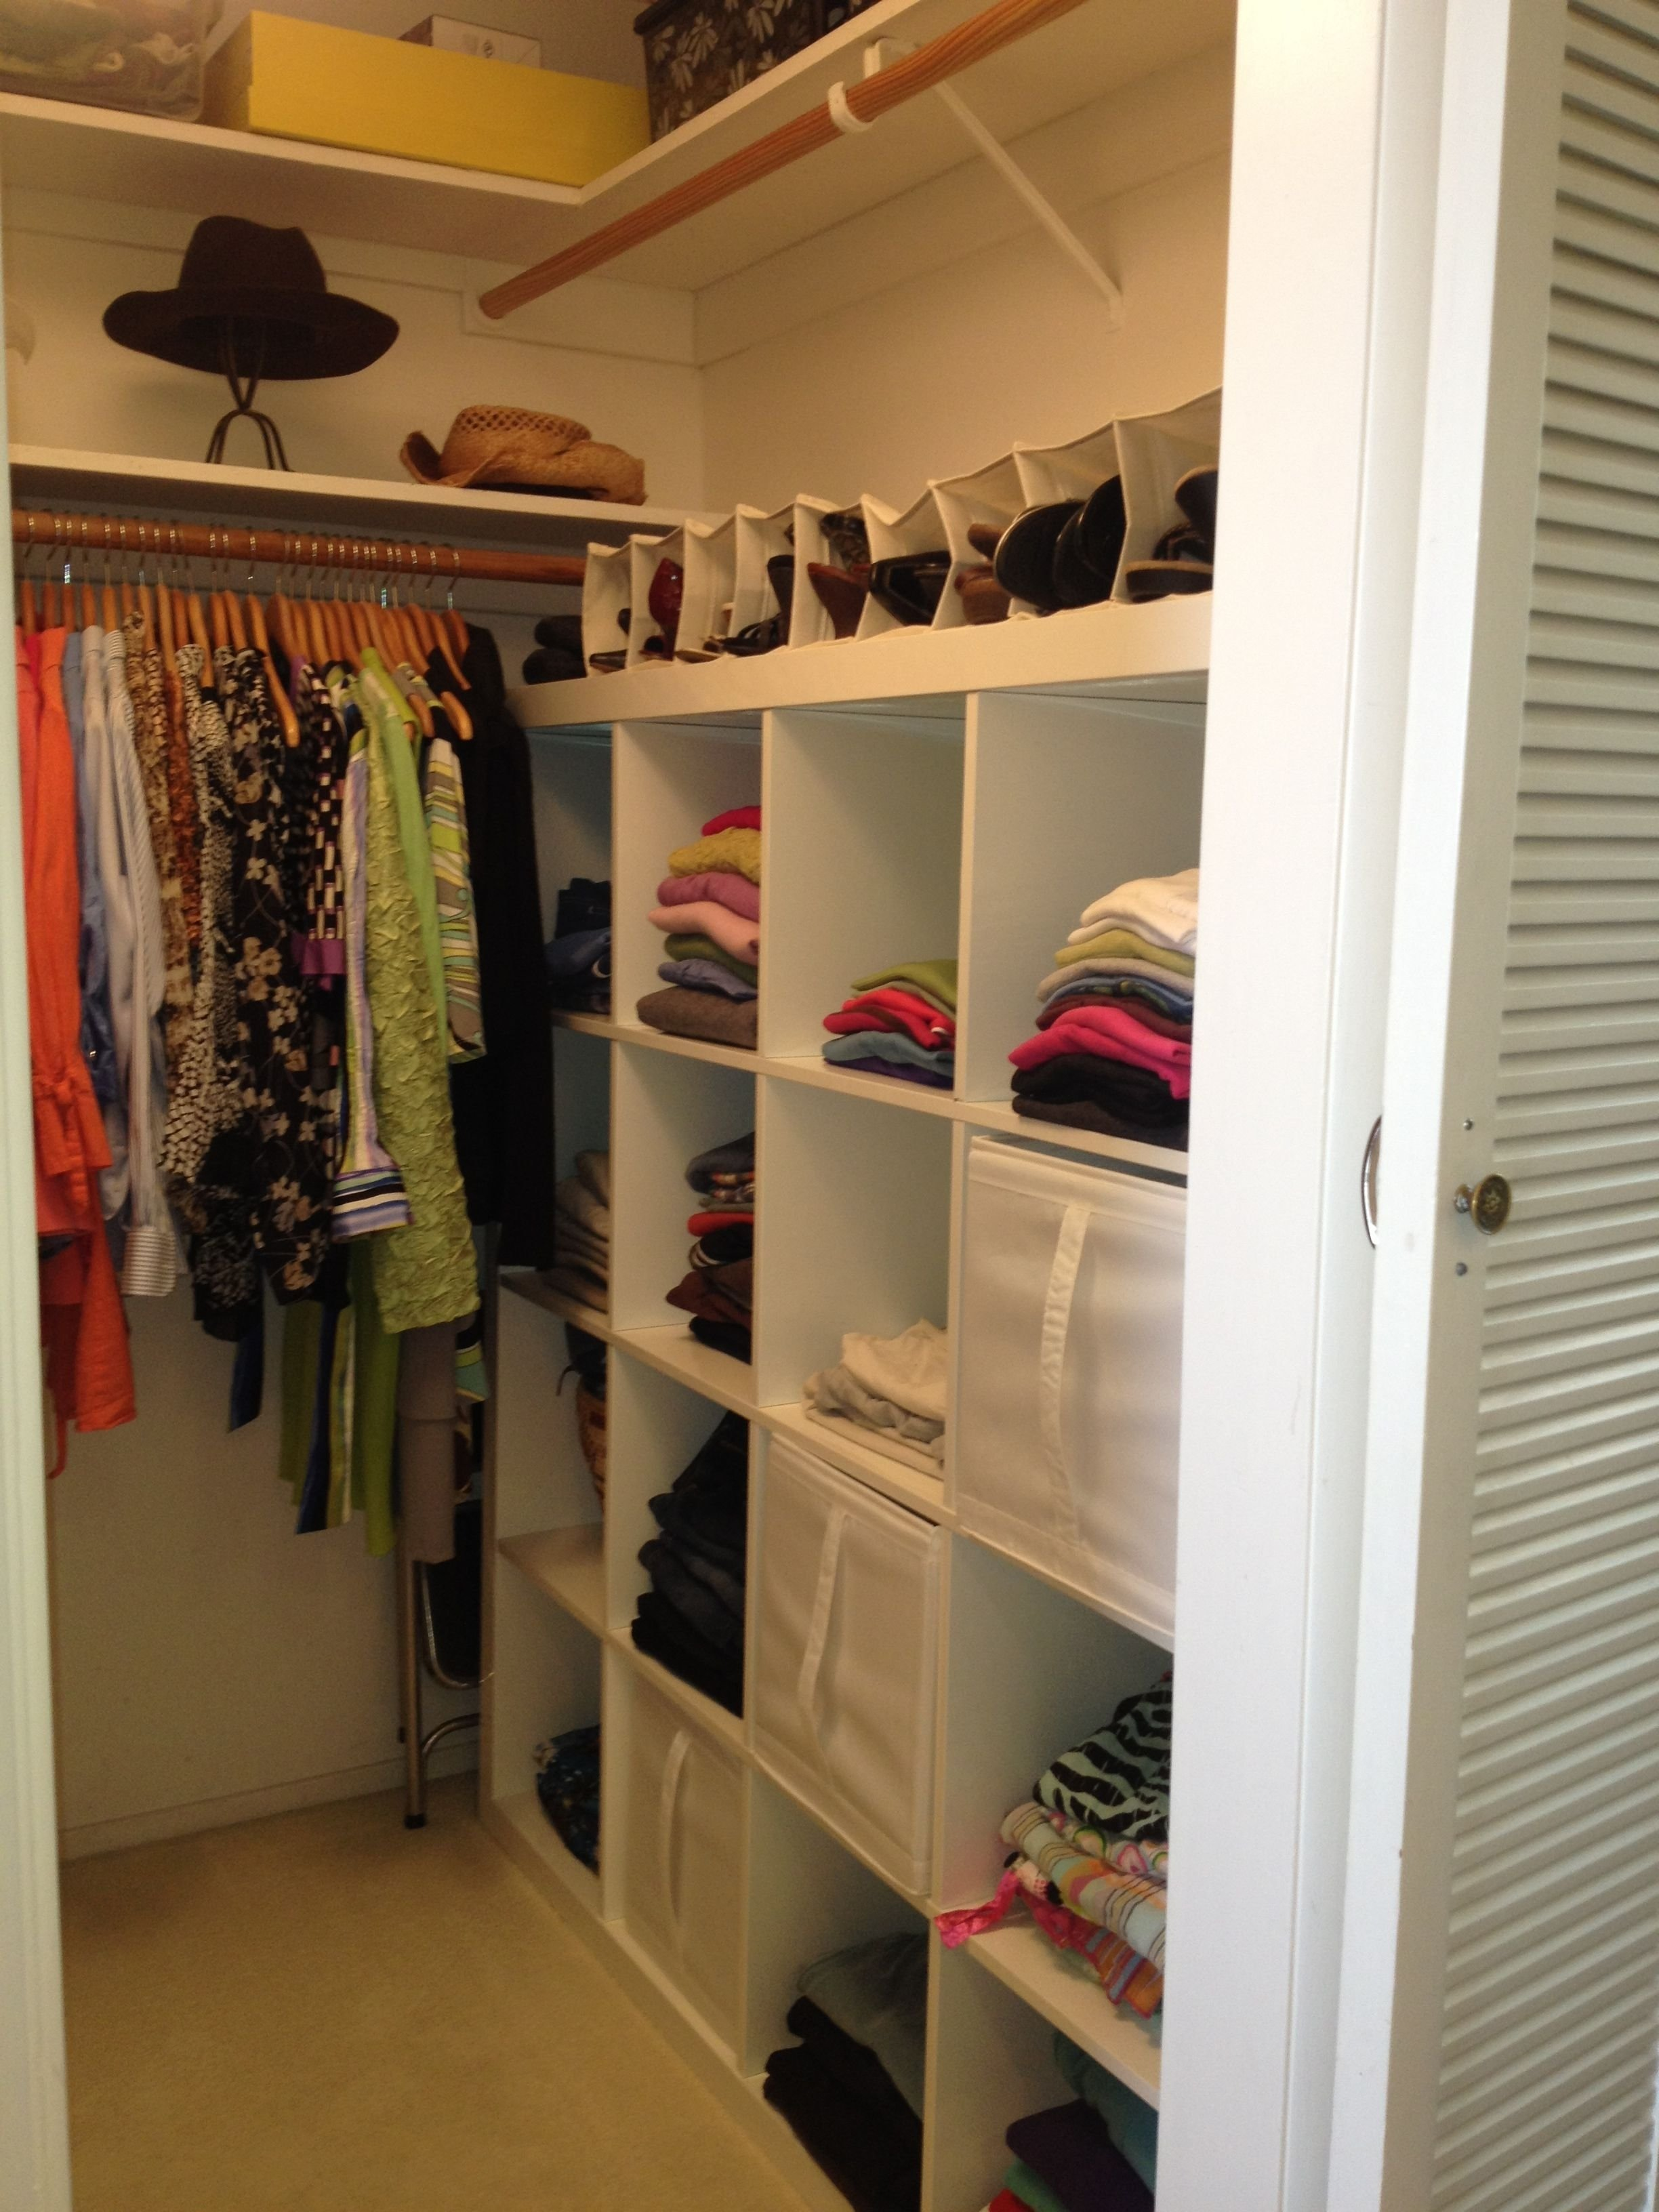 10 Fantastic Small Walk In Closet Design Ideas 12 small walk in closet ideas and organizer designs closet designs 1